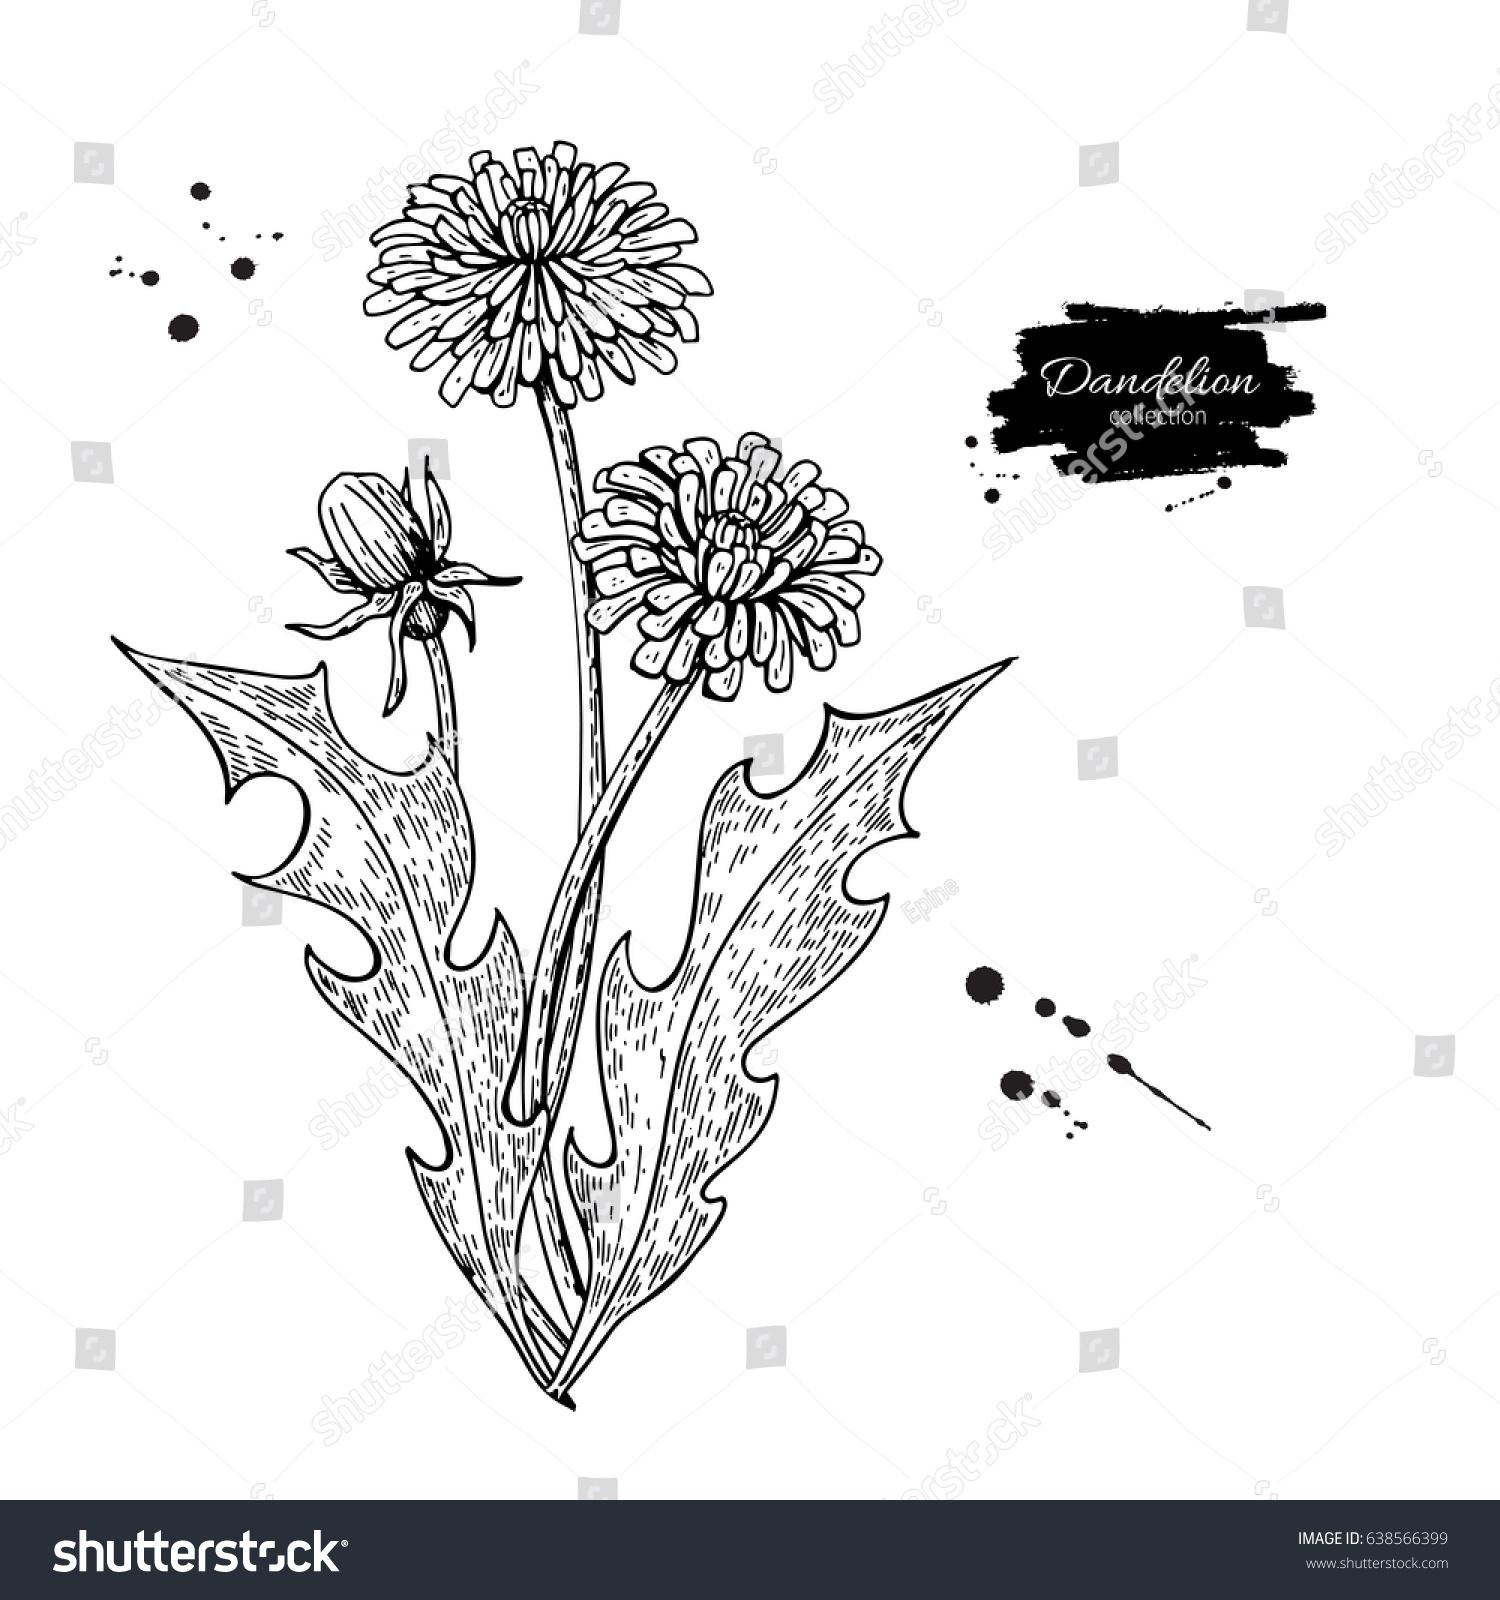 Dandelion Flower Line Drawing : Dandelion flower vector drawing set isolated stock